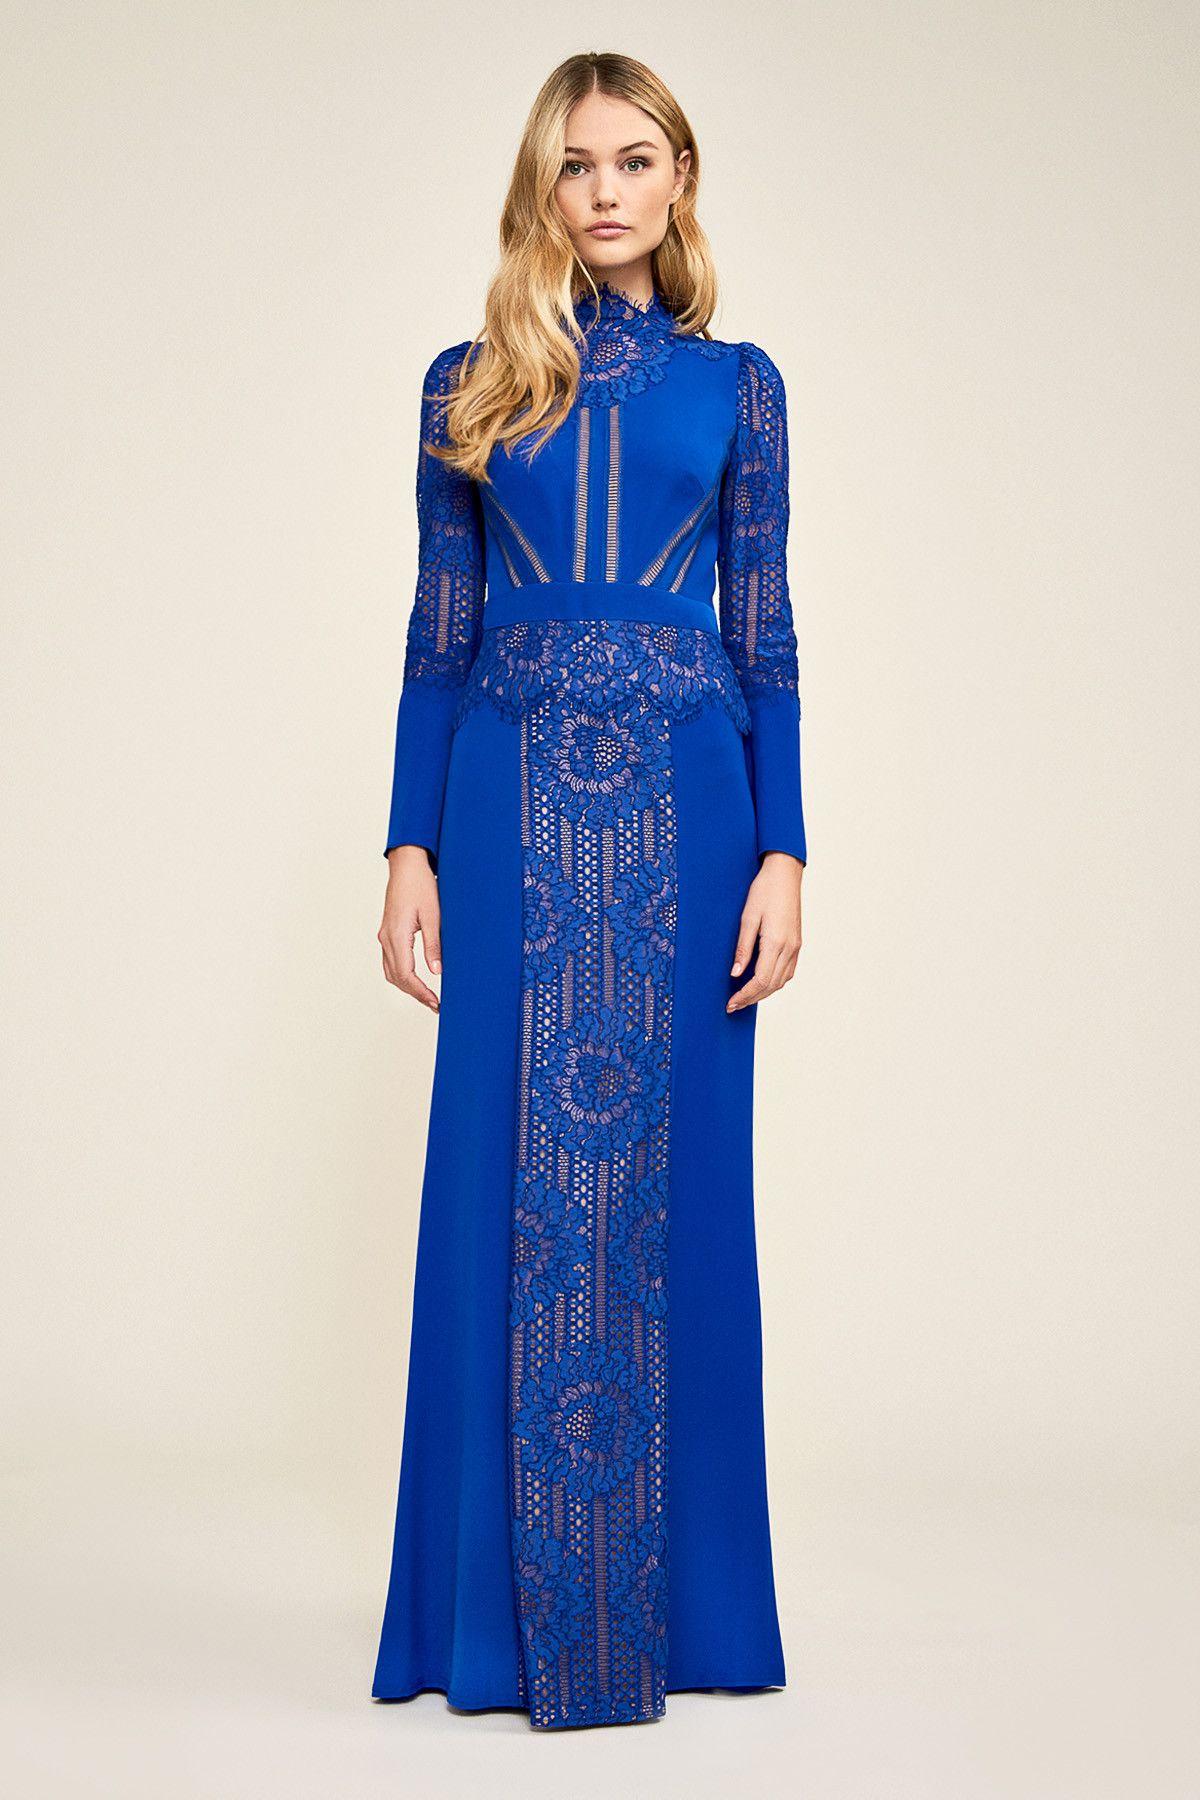 aad3e41c42 Tadashi Shoji - Marianna Crepe Long Sleeve Gown